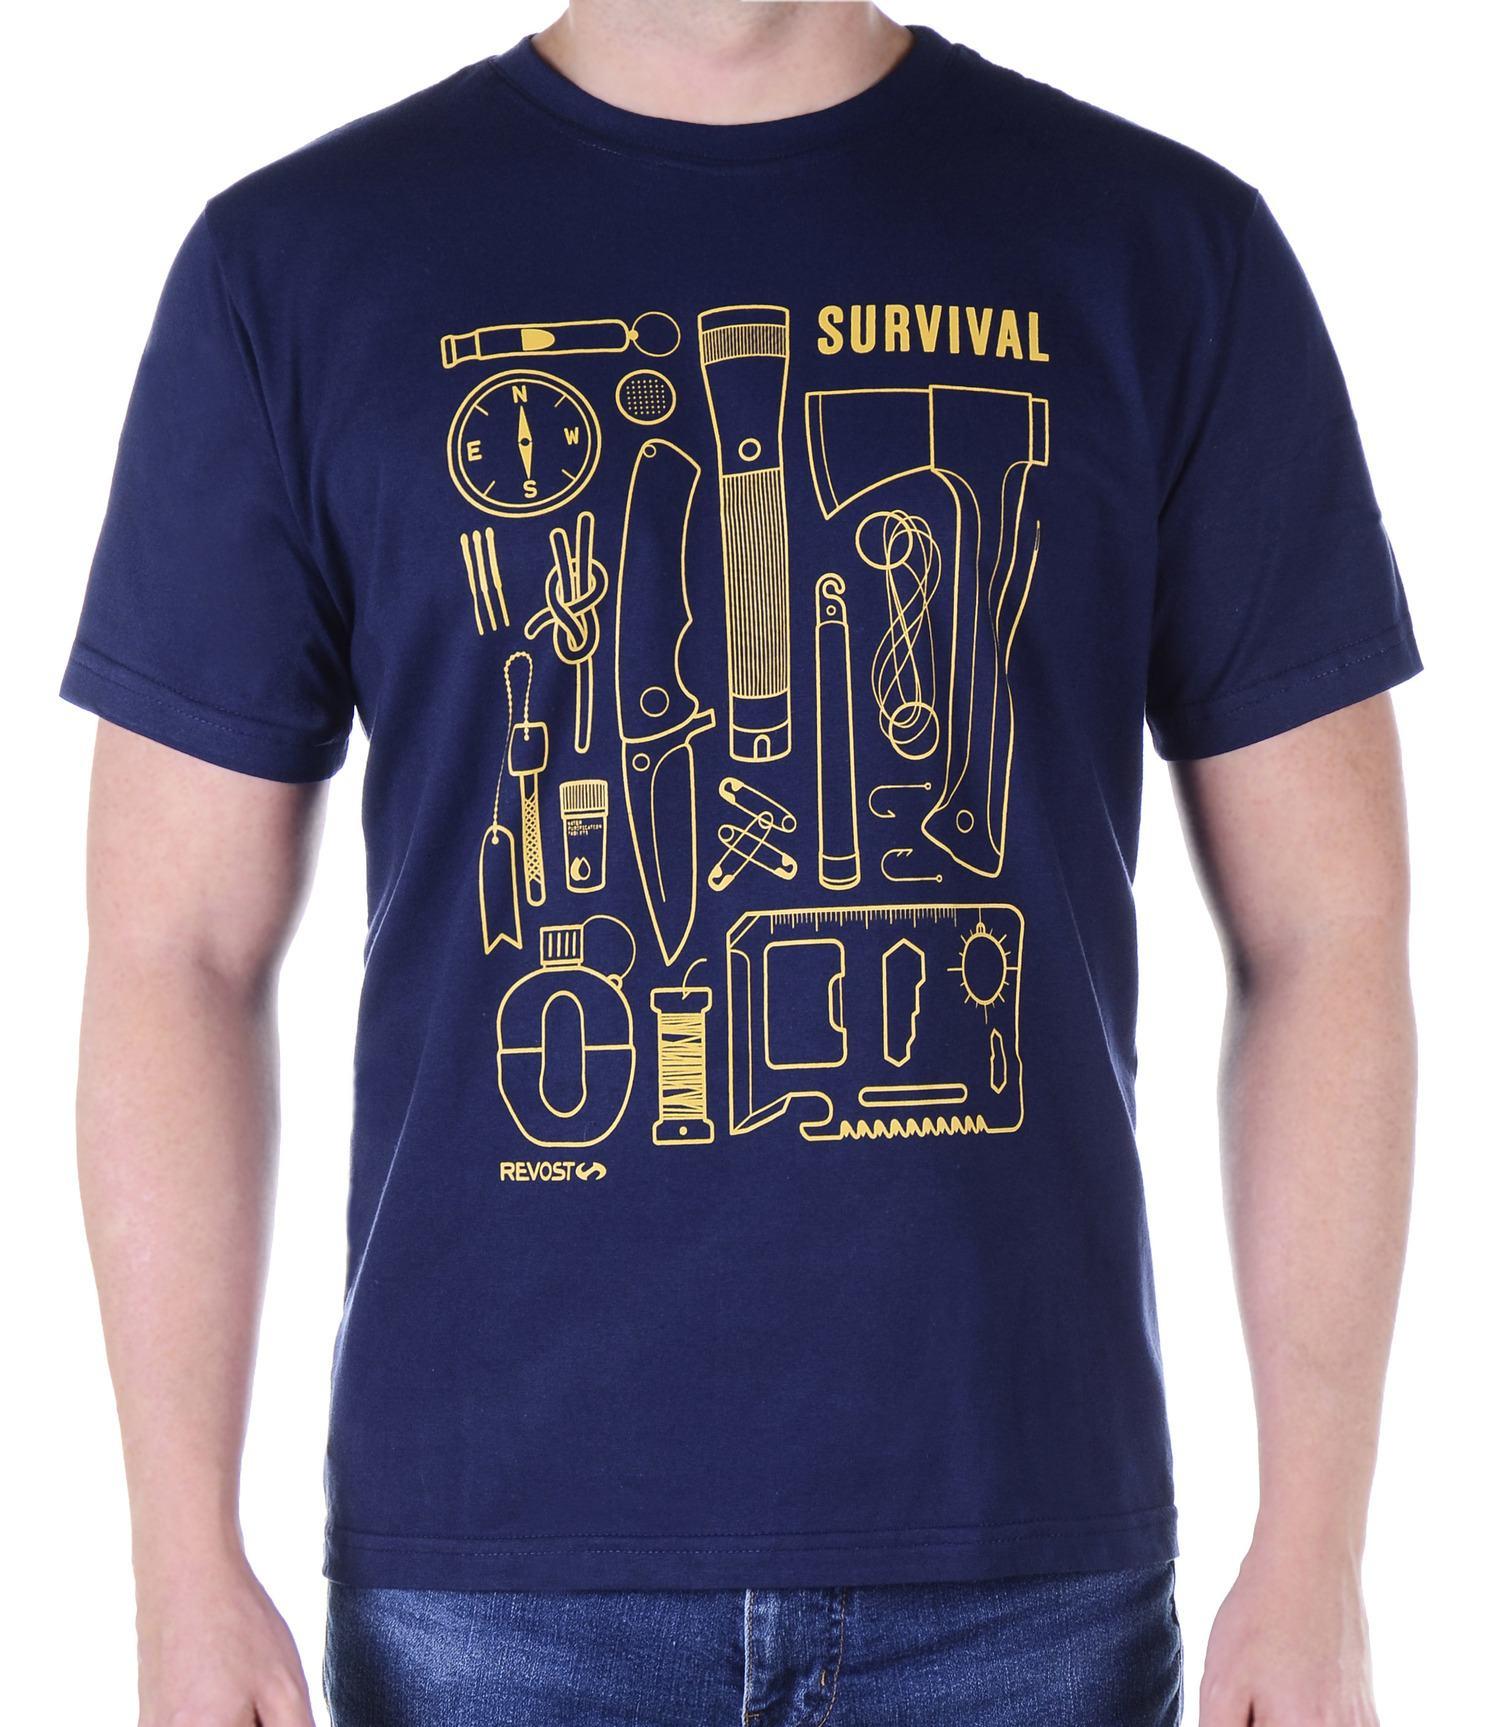 Camiseta Masculina Revost Survival - Marinho